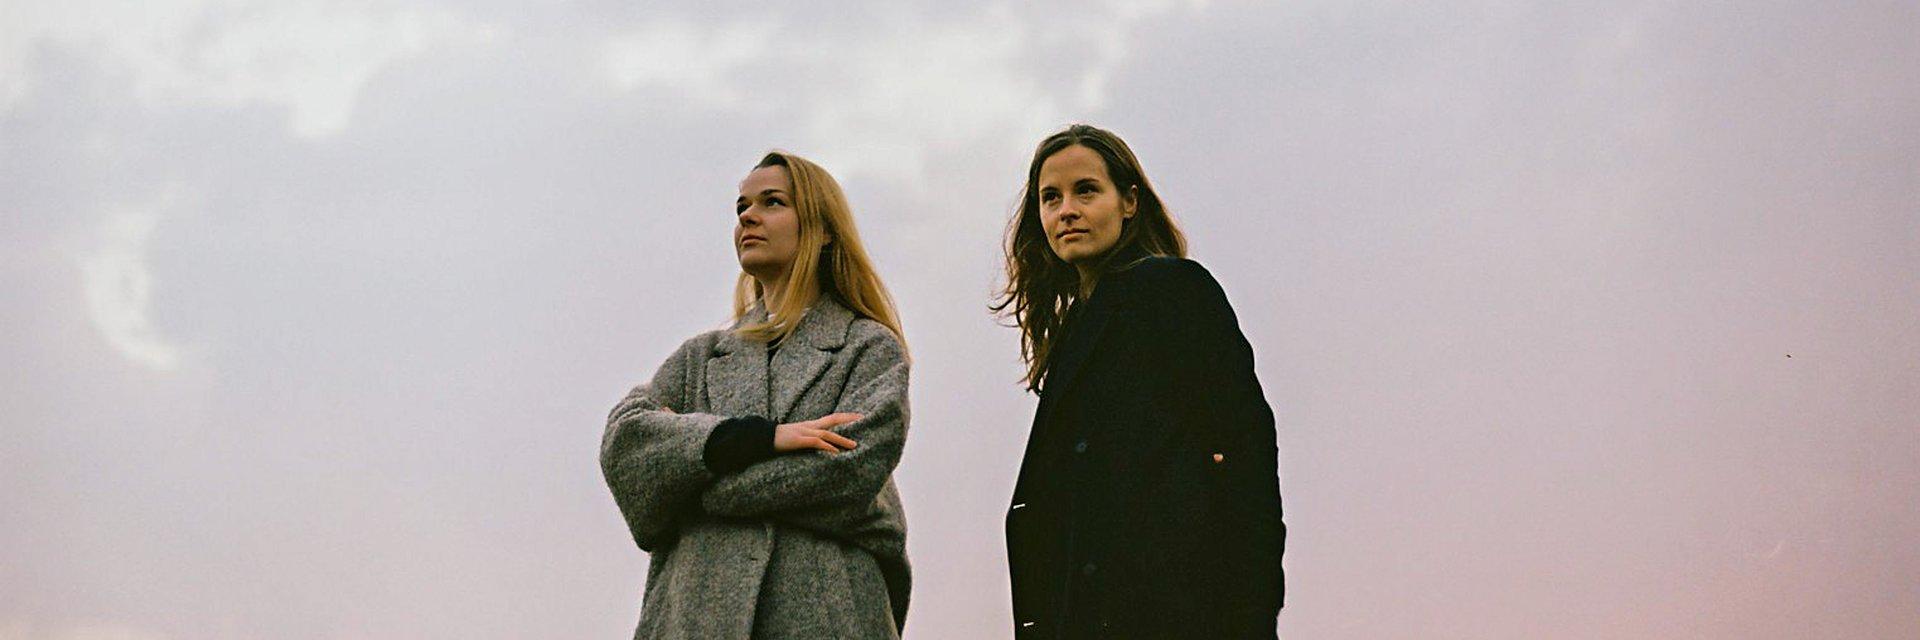 "Hania Rani i Dobrawa Czocher prezentują debiut dla Deutsche Grammophon, album ""Inner Symphonies""!"